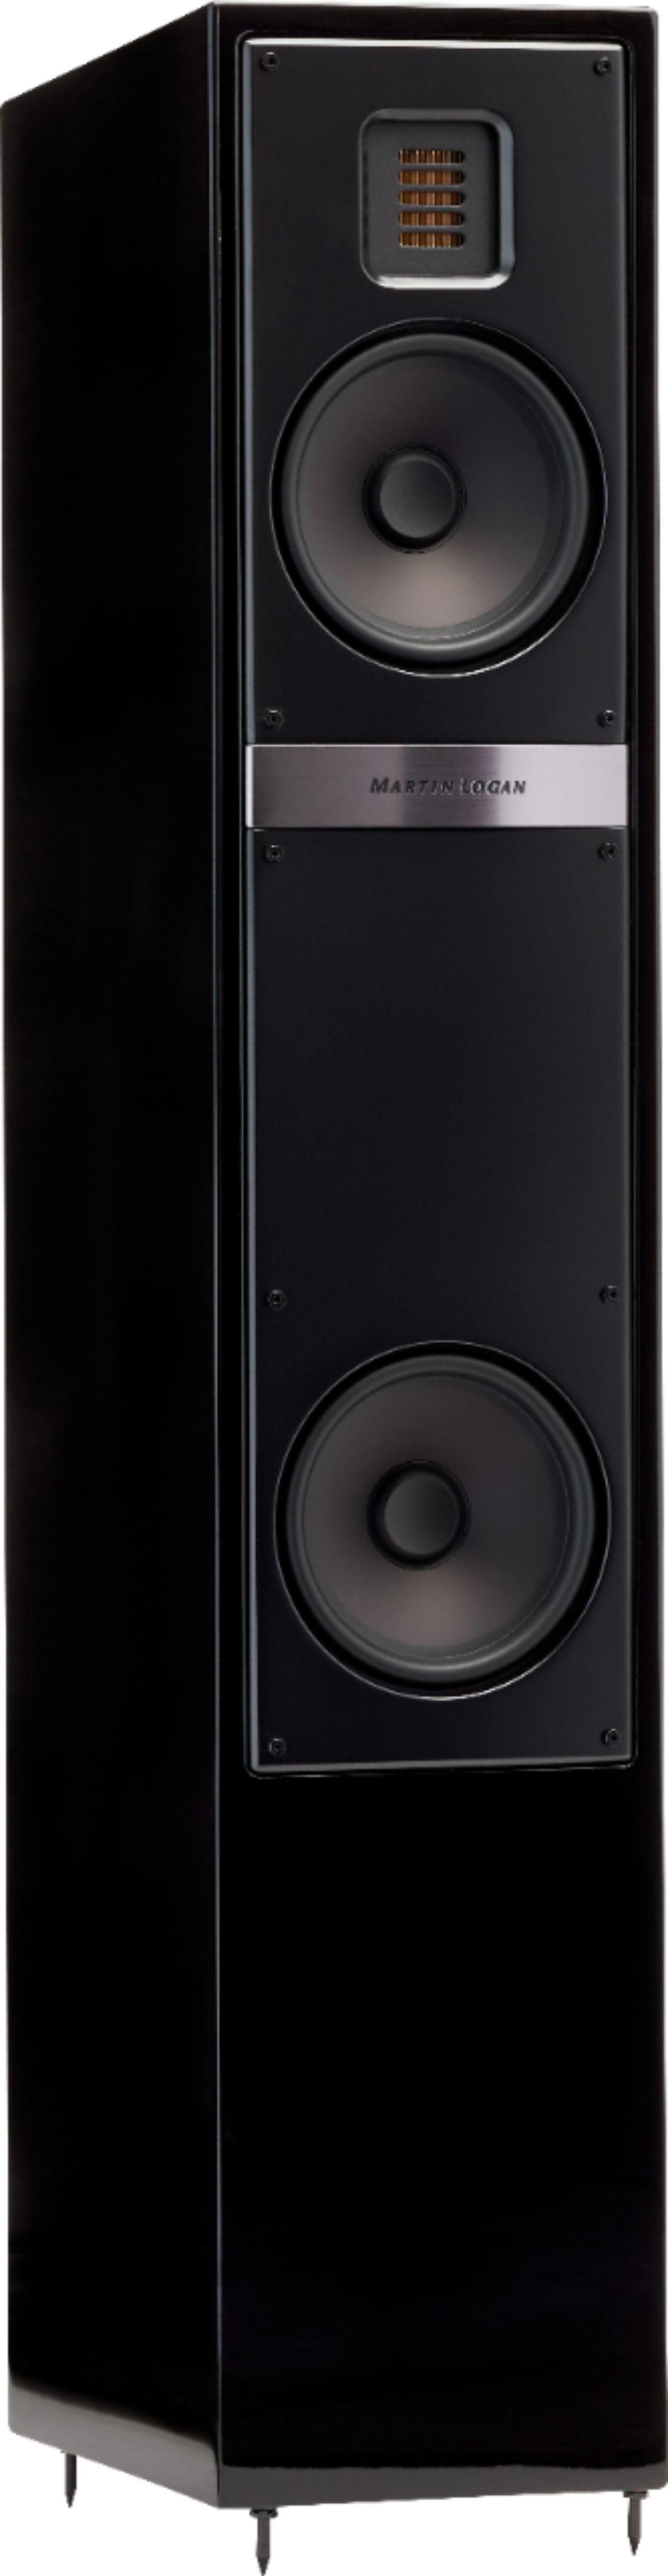 "Motion Dual 5-1/2"" Passive 2.5-Way Floor Speaker (Each)"